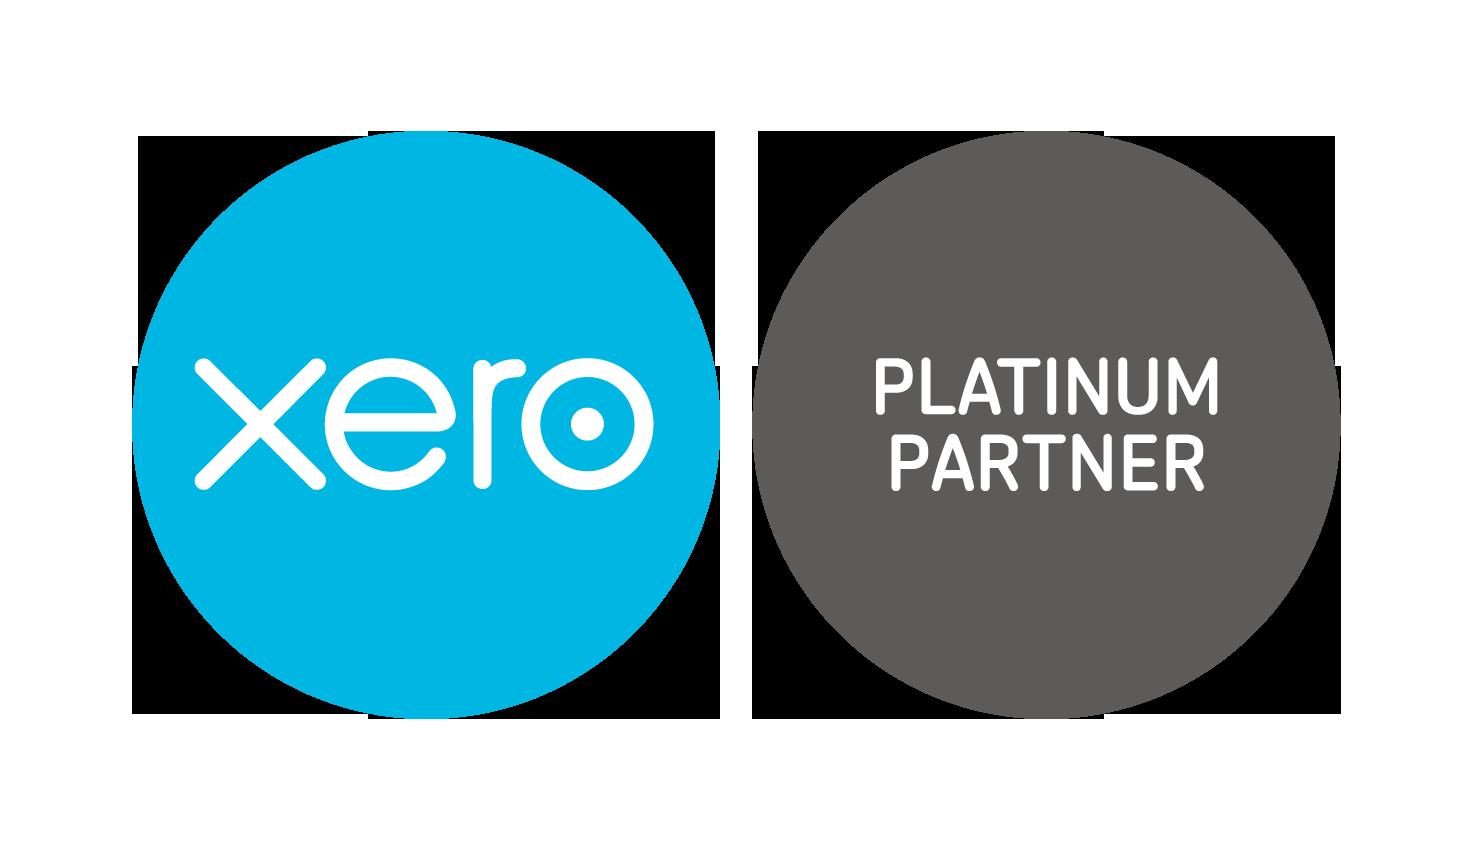 xero-platinum-partner-logo-RGB.png